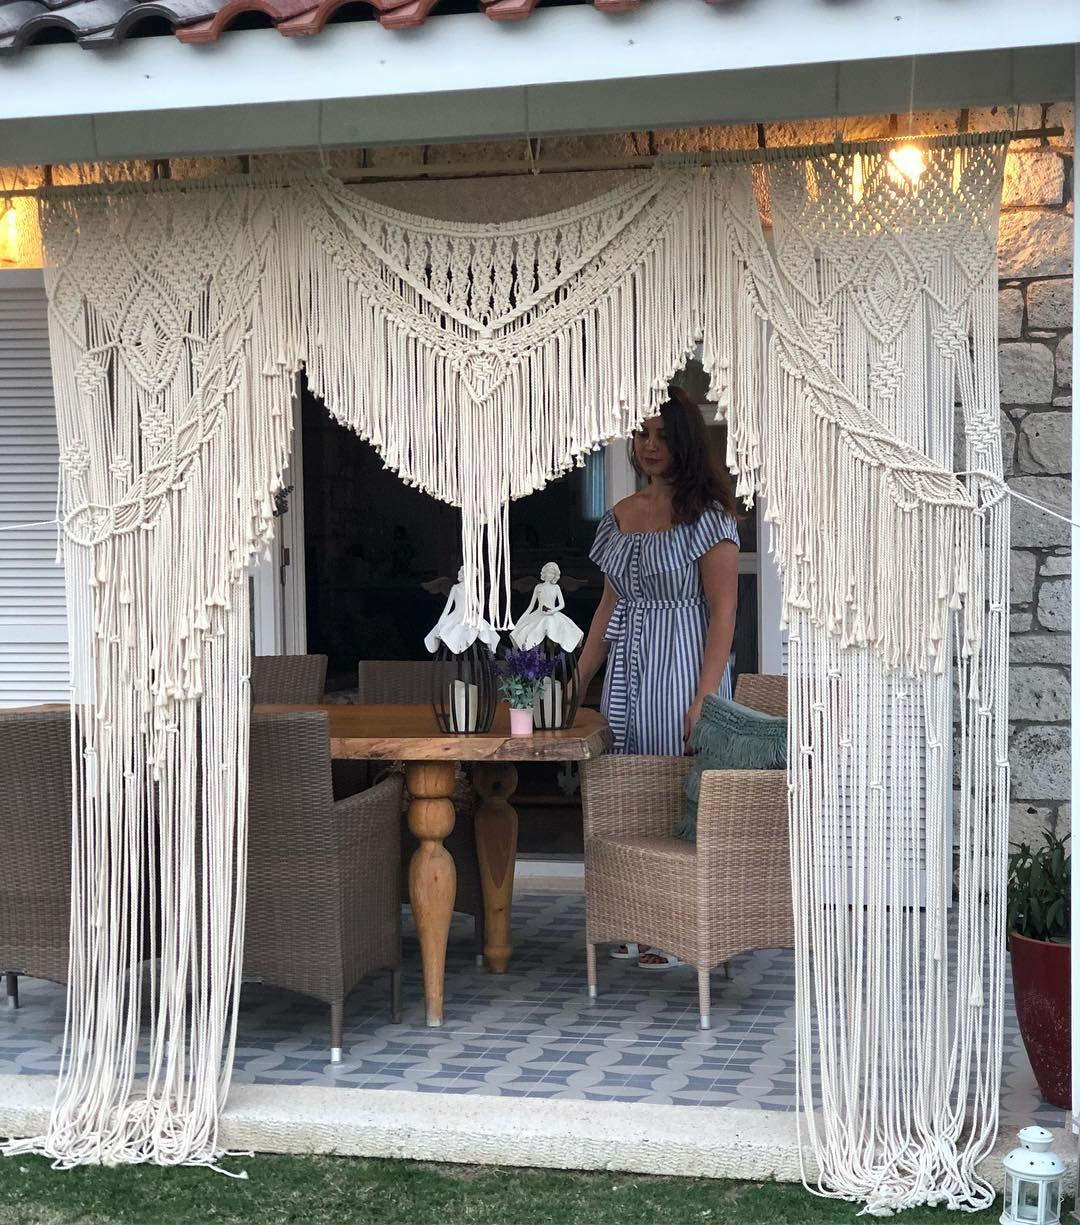 "Macrame Wall Decor Hanging - Bohemian Home Geometric Art Decor - Beautiful Apartment Dorm Room Decoration-Macrame Curtain-Macrame Wedding Backdrop for Christmas & Holiday Decorations W 80"" x L 88""Inch"